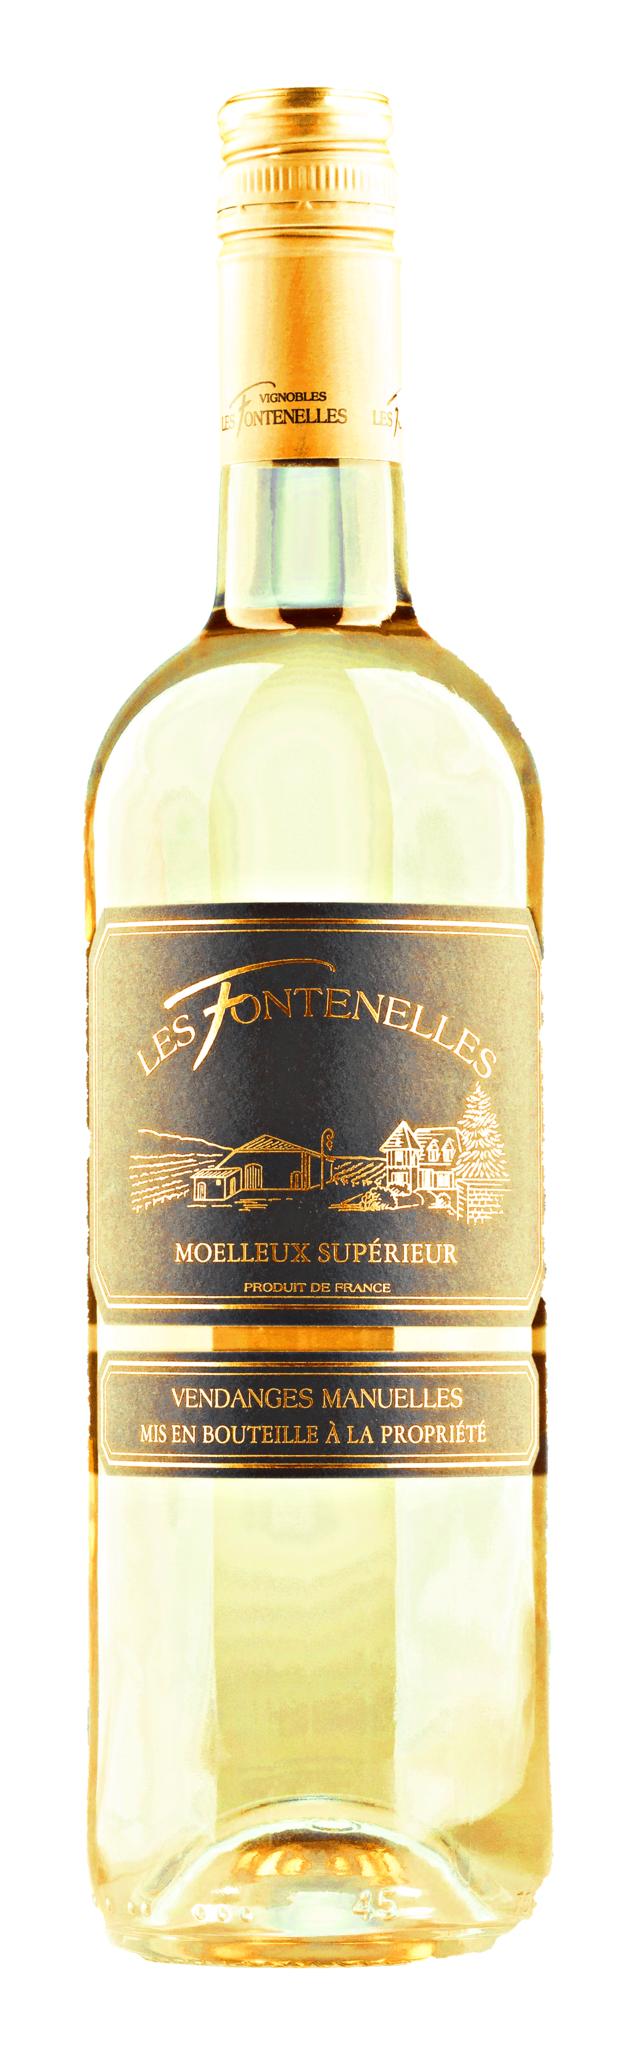 Fontenelles, Château les - Bergerac 2018 Bergerac moelleux superieur, Château les Fontenelles